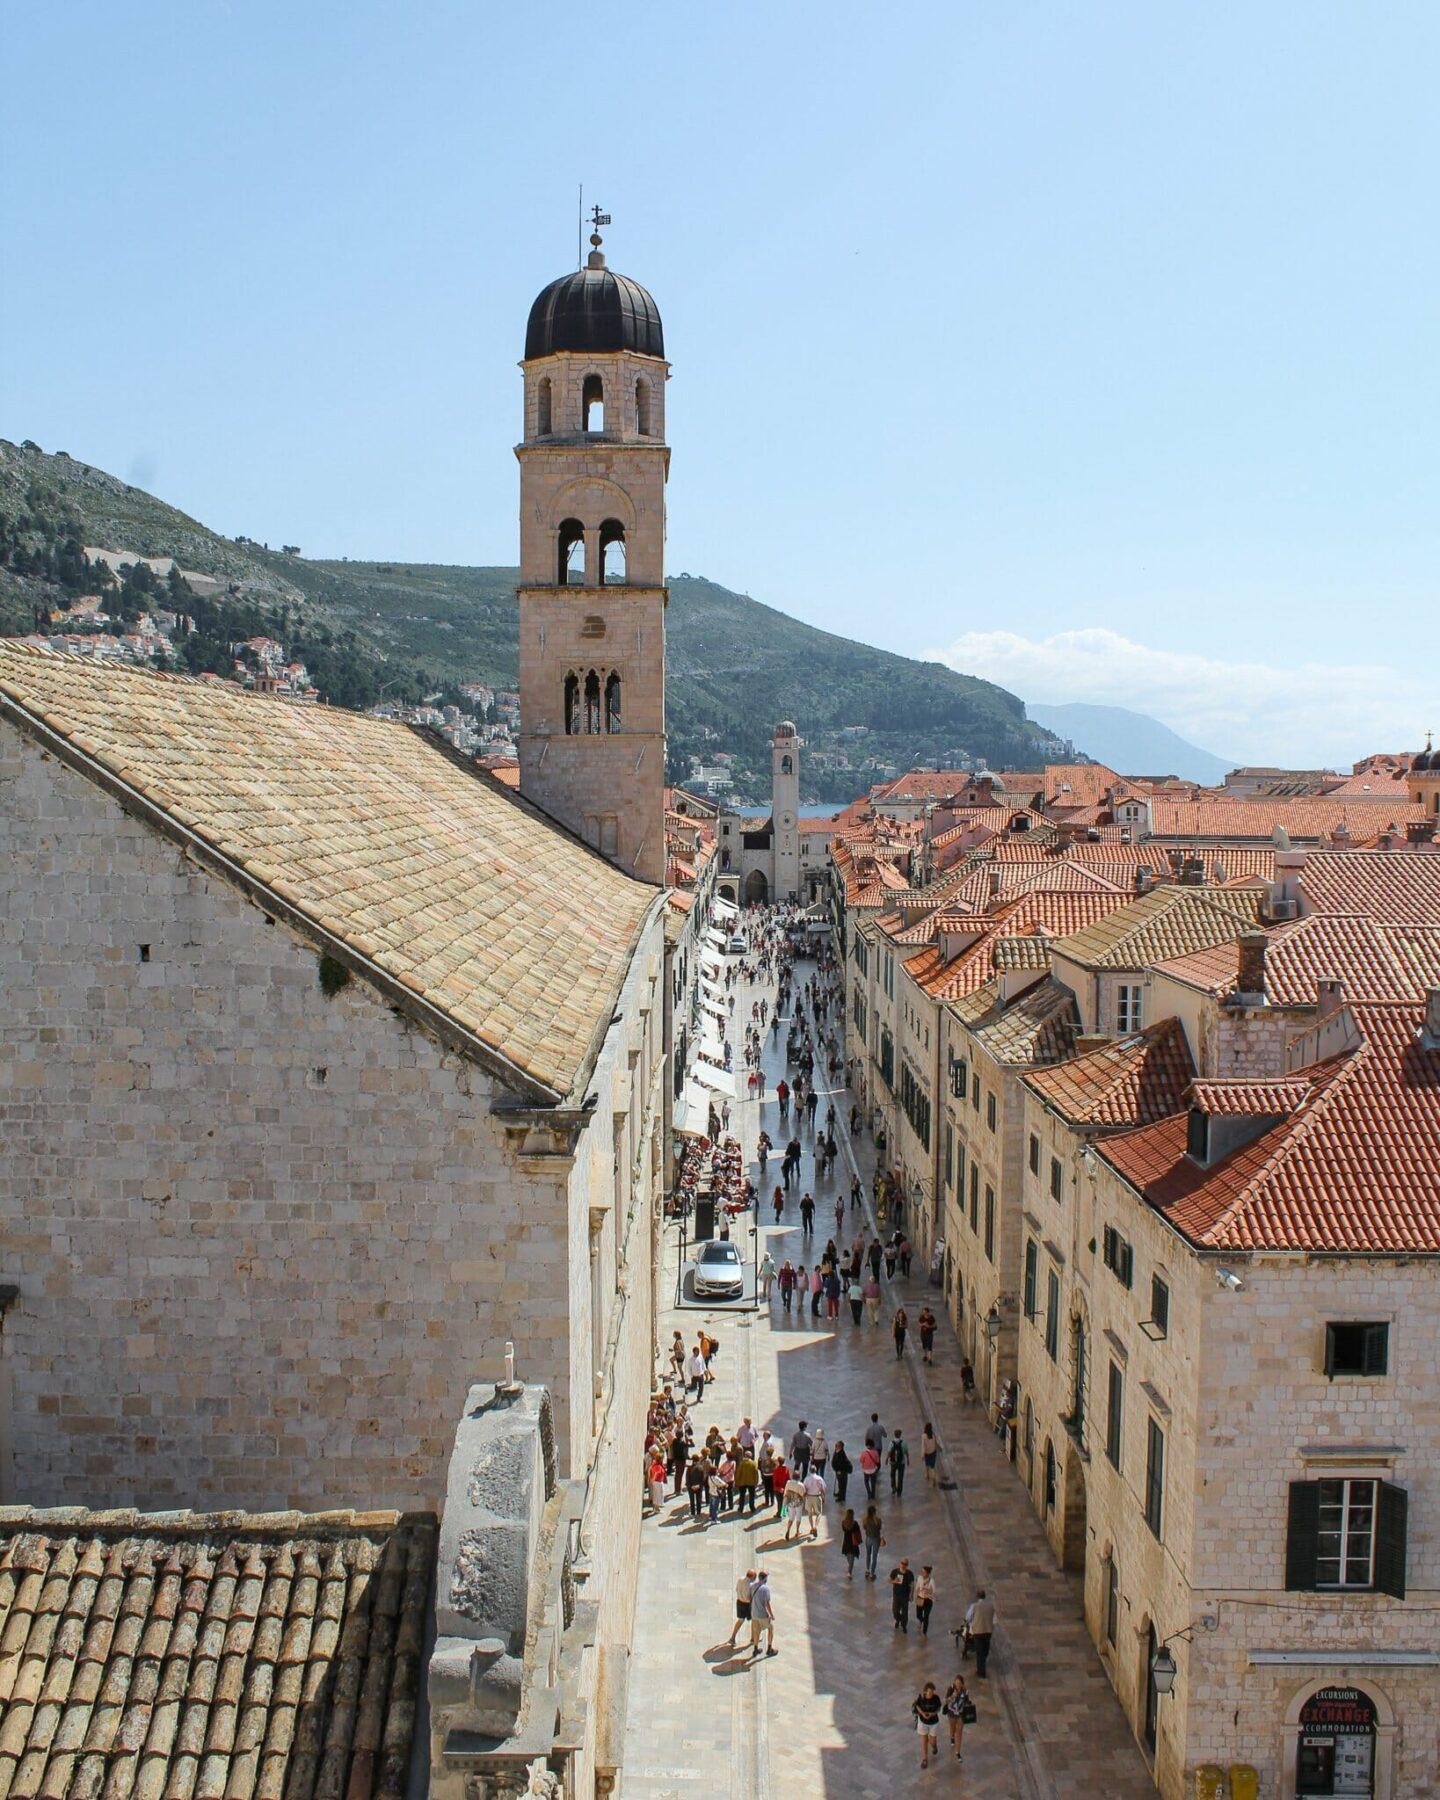 A week in Dubrovnik - The Stradun